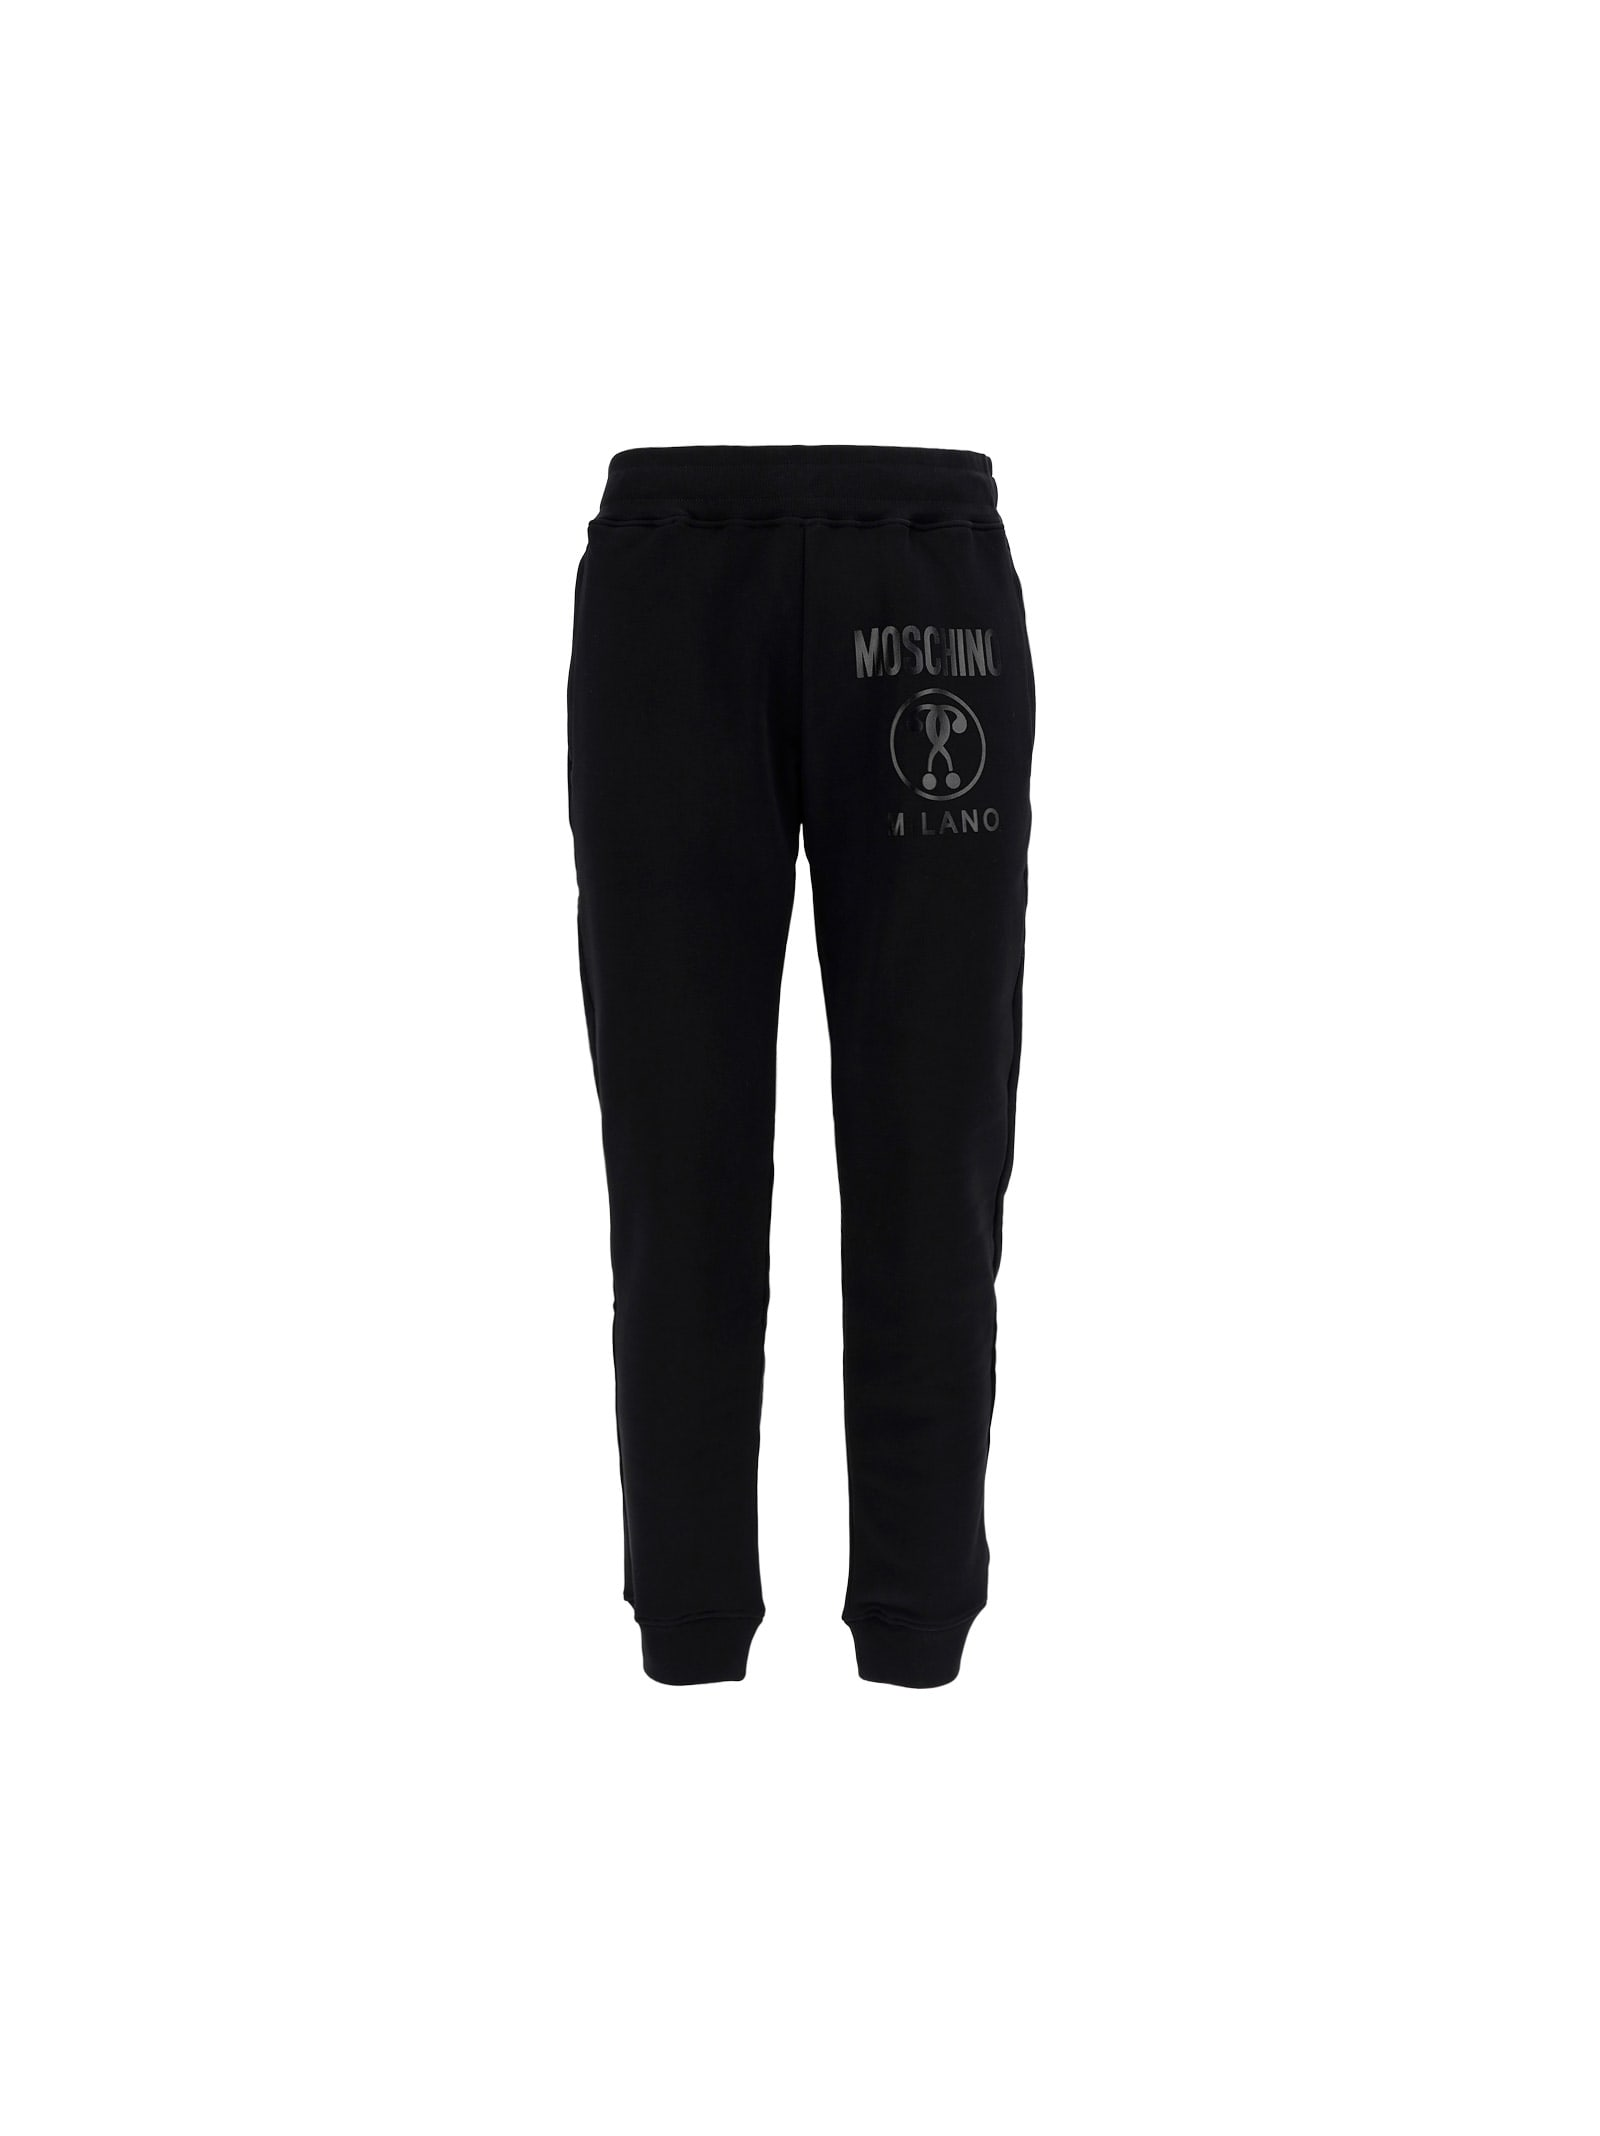 Moschino Pants